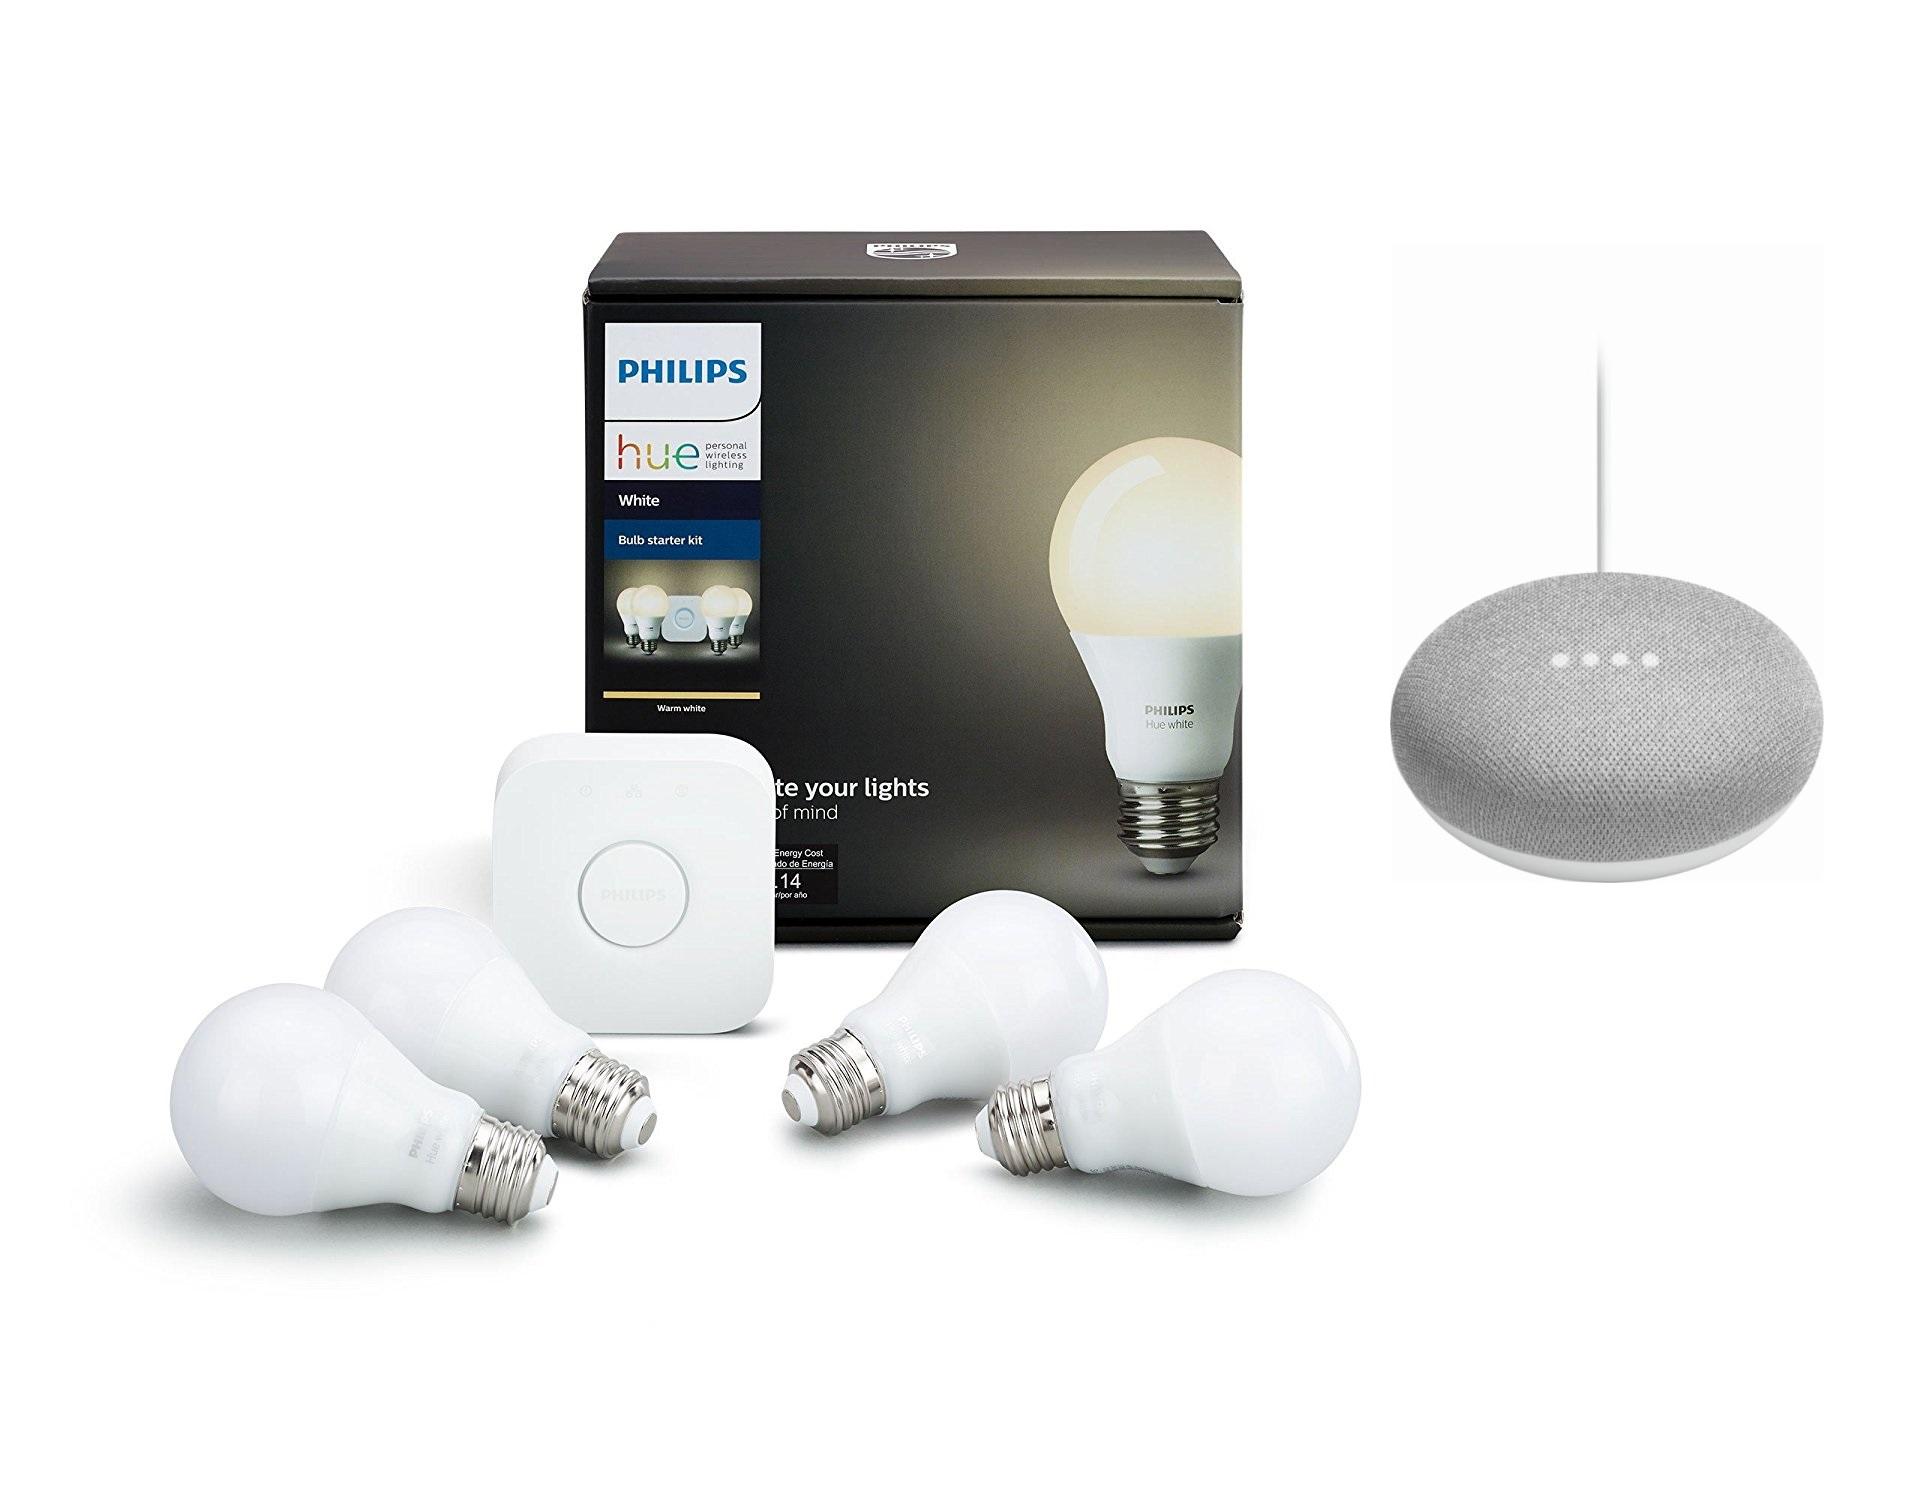 Philips Hue White A19 4-Bulb Starter Kit + Google Home Mini ...